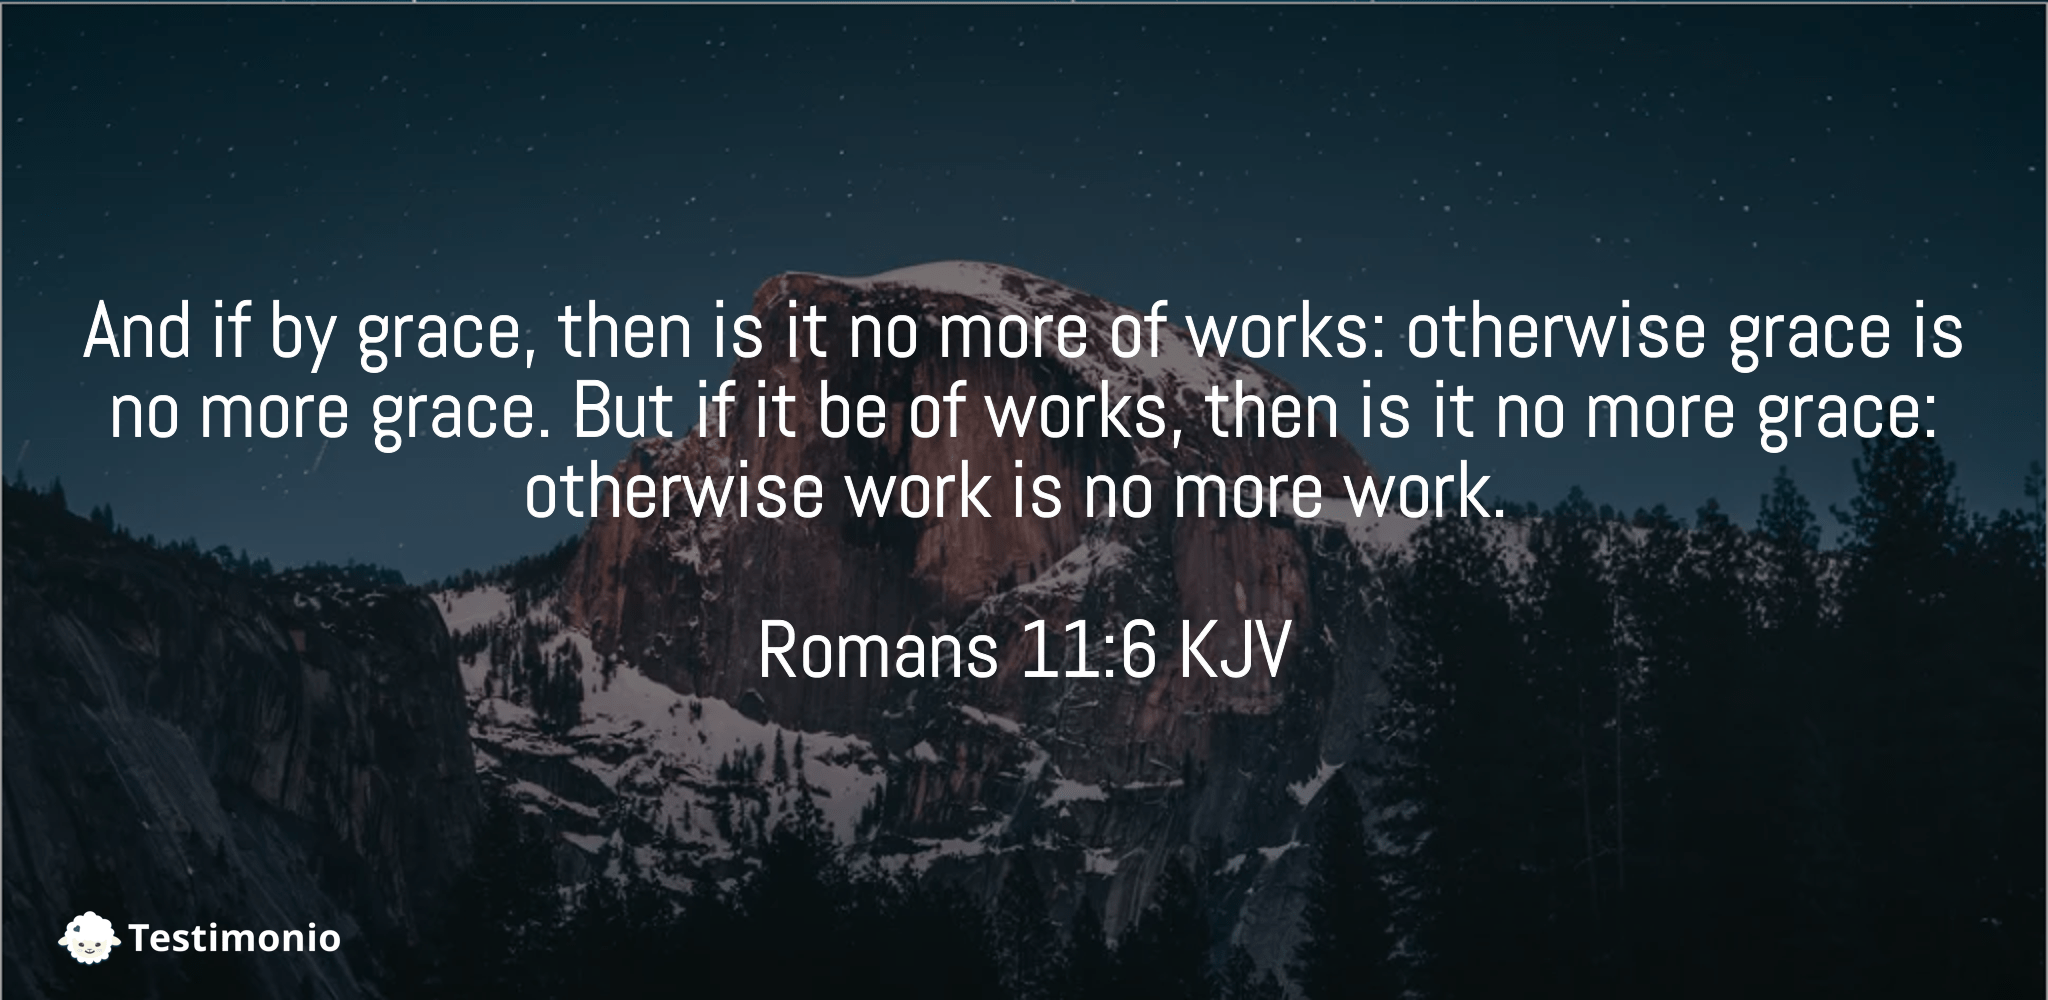 Romans 11:6